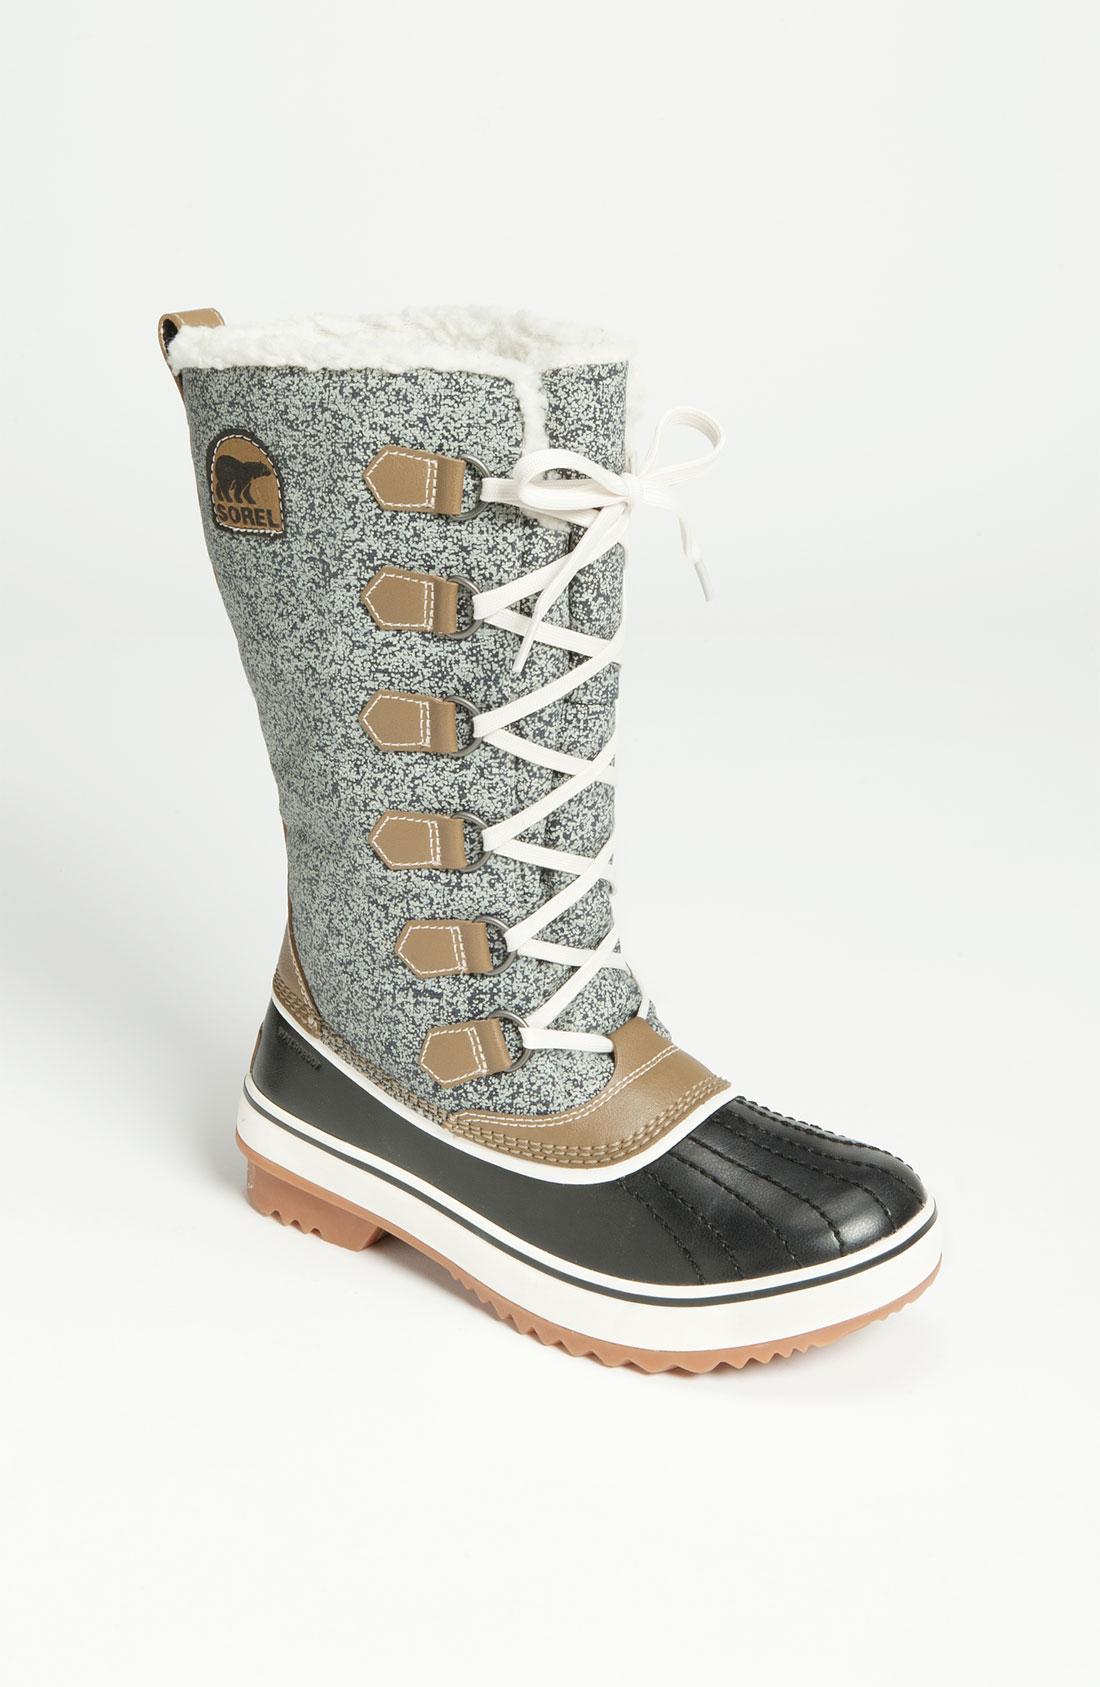 Women;s Sorel Tivoli High Snow Boots   Homewood Mountain Ski Resort